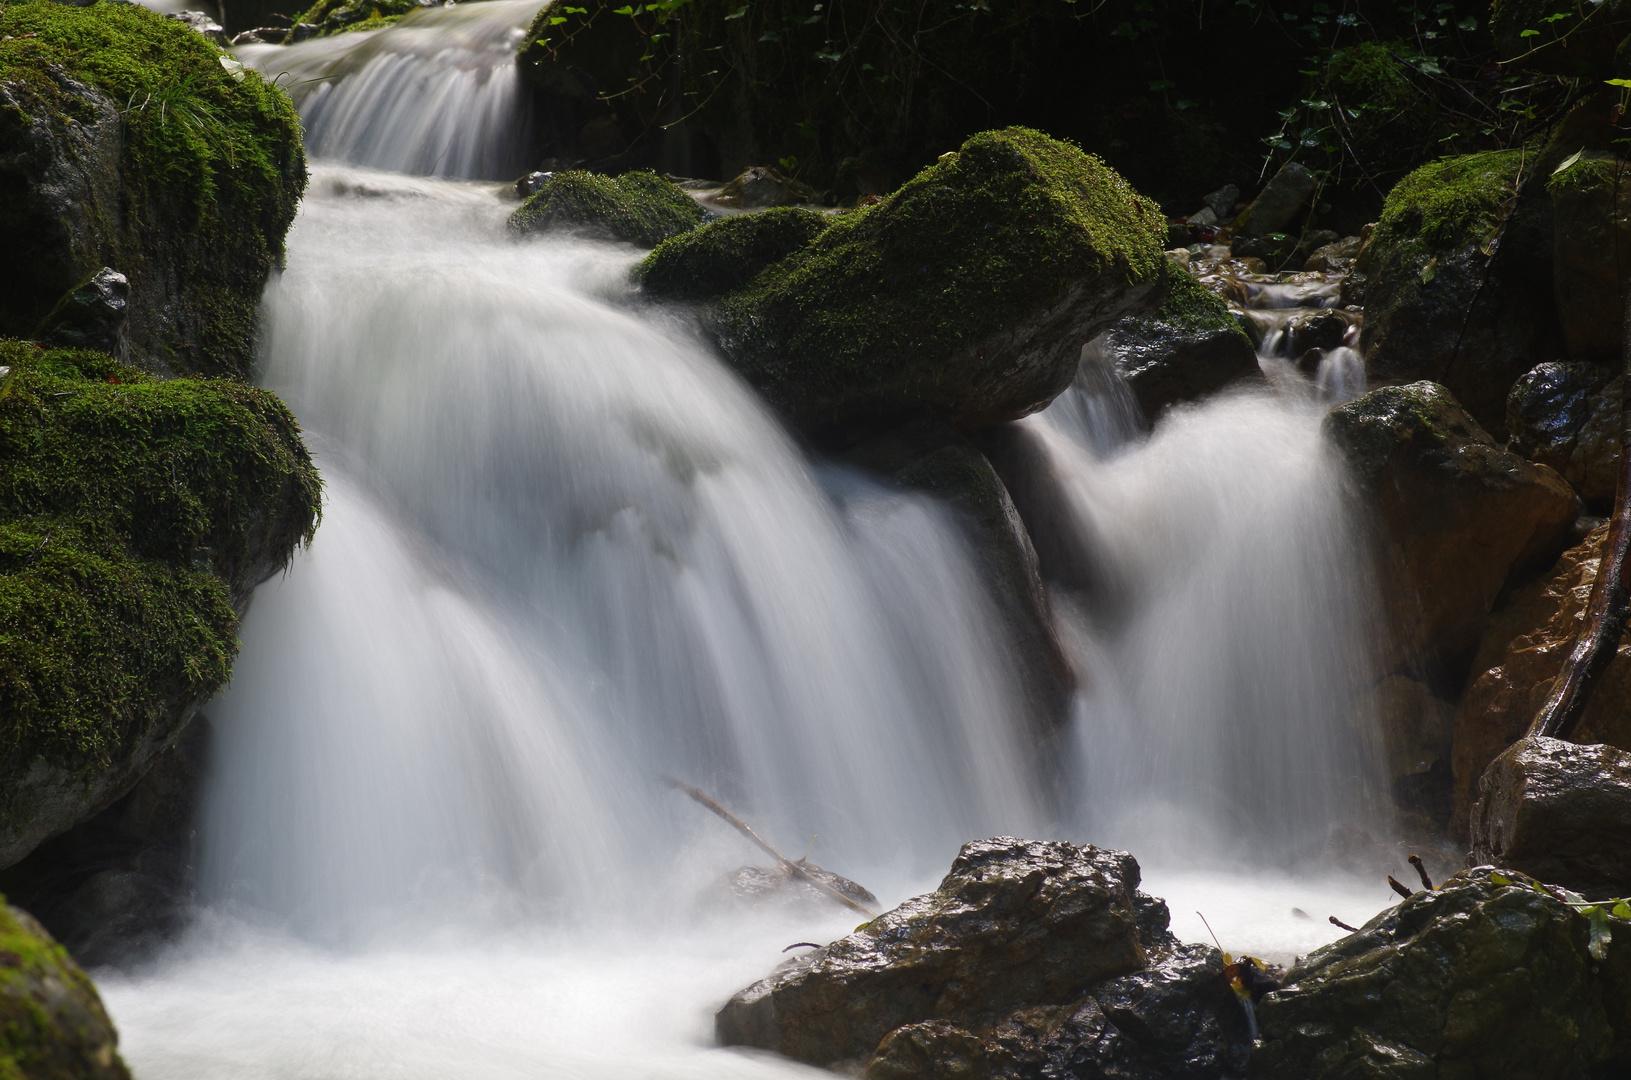 Wasserfall in Wasserfallen